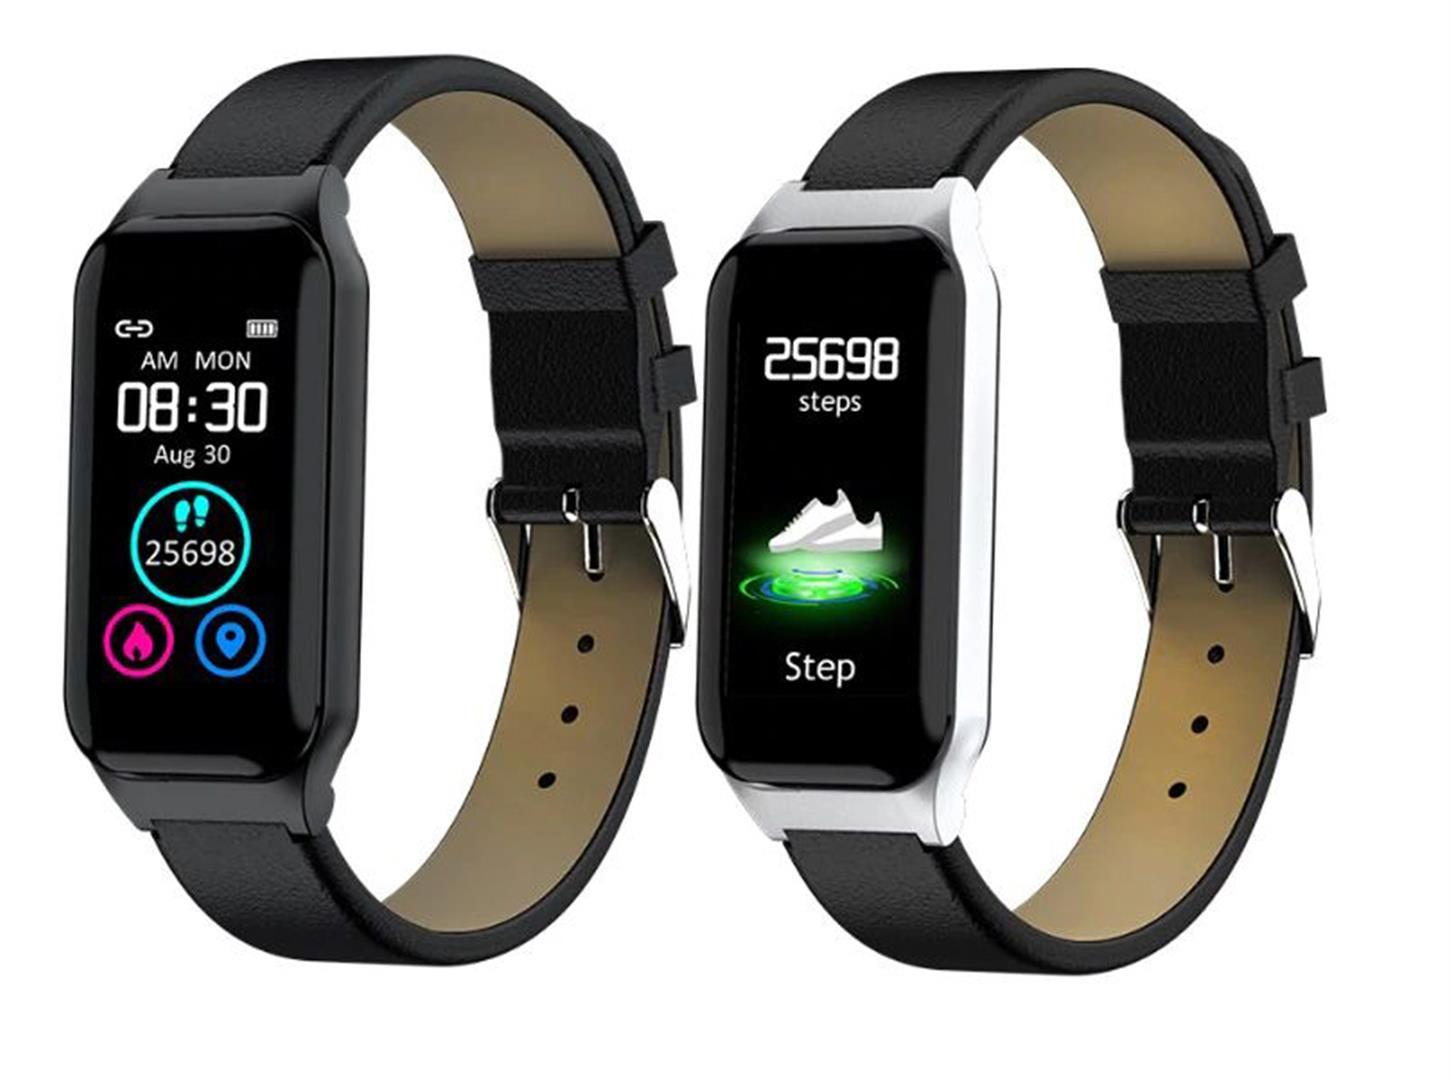 Fitness Smart Watch with Bluetooth Earphones - 15